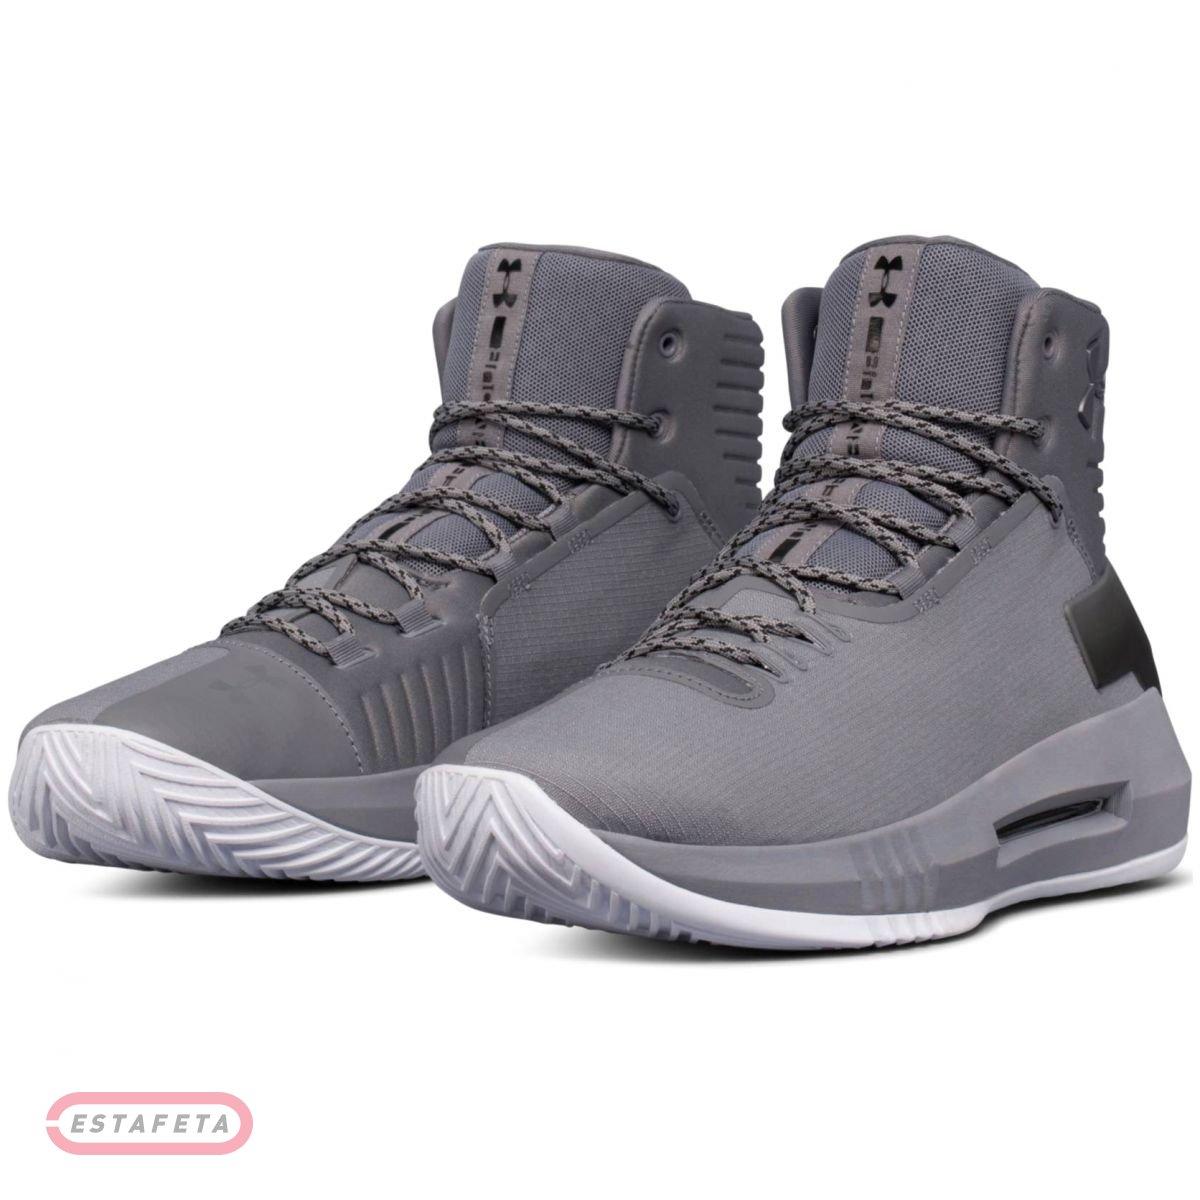 a35a7c29 Кроссовки для баскетбола Under Armour Drive 4 3020225-101 купить ...